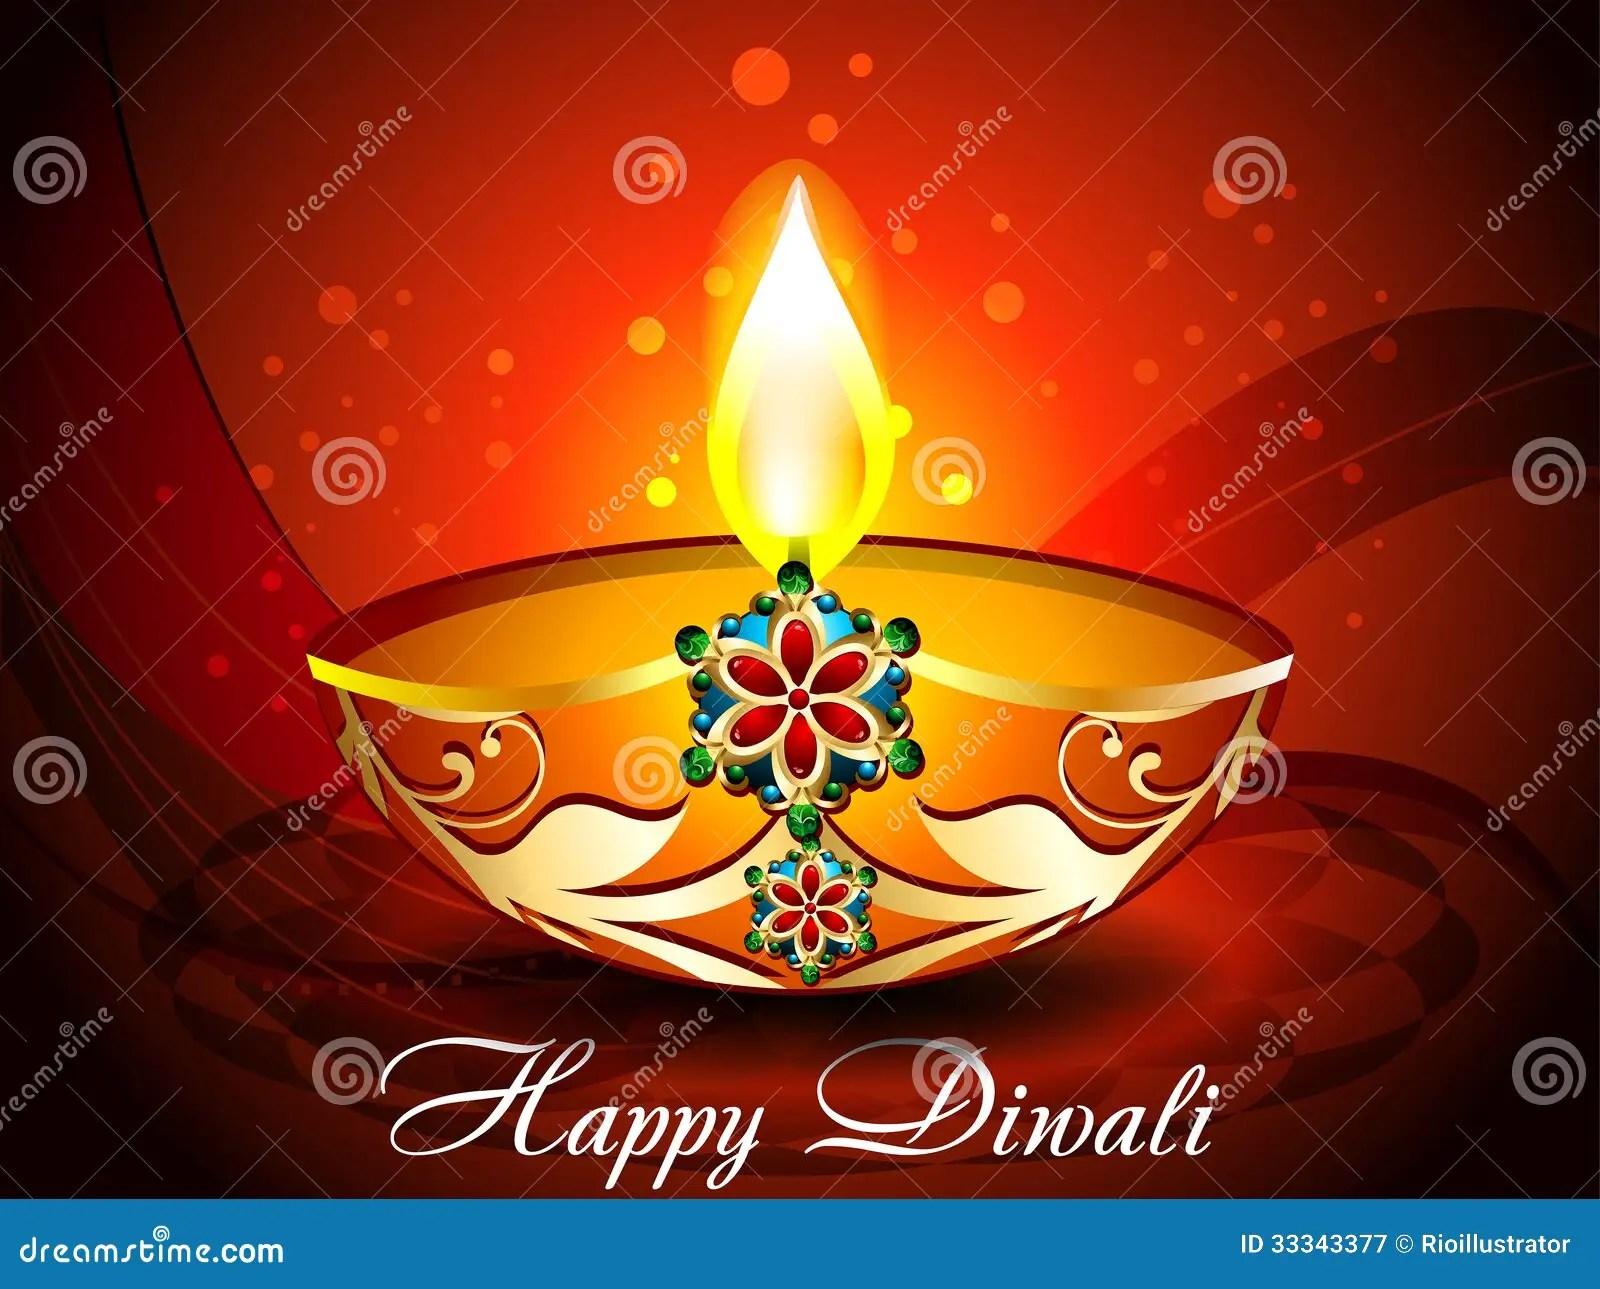 Hd Wallpaper Diwali Light Dark Diwali Background Royalty Free Stock Photography